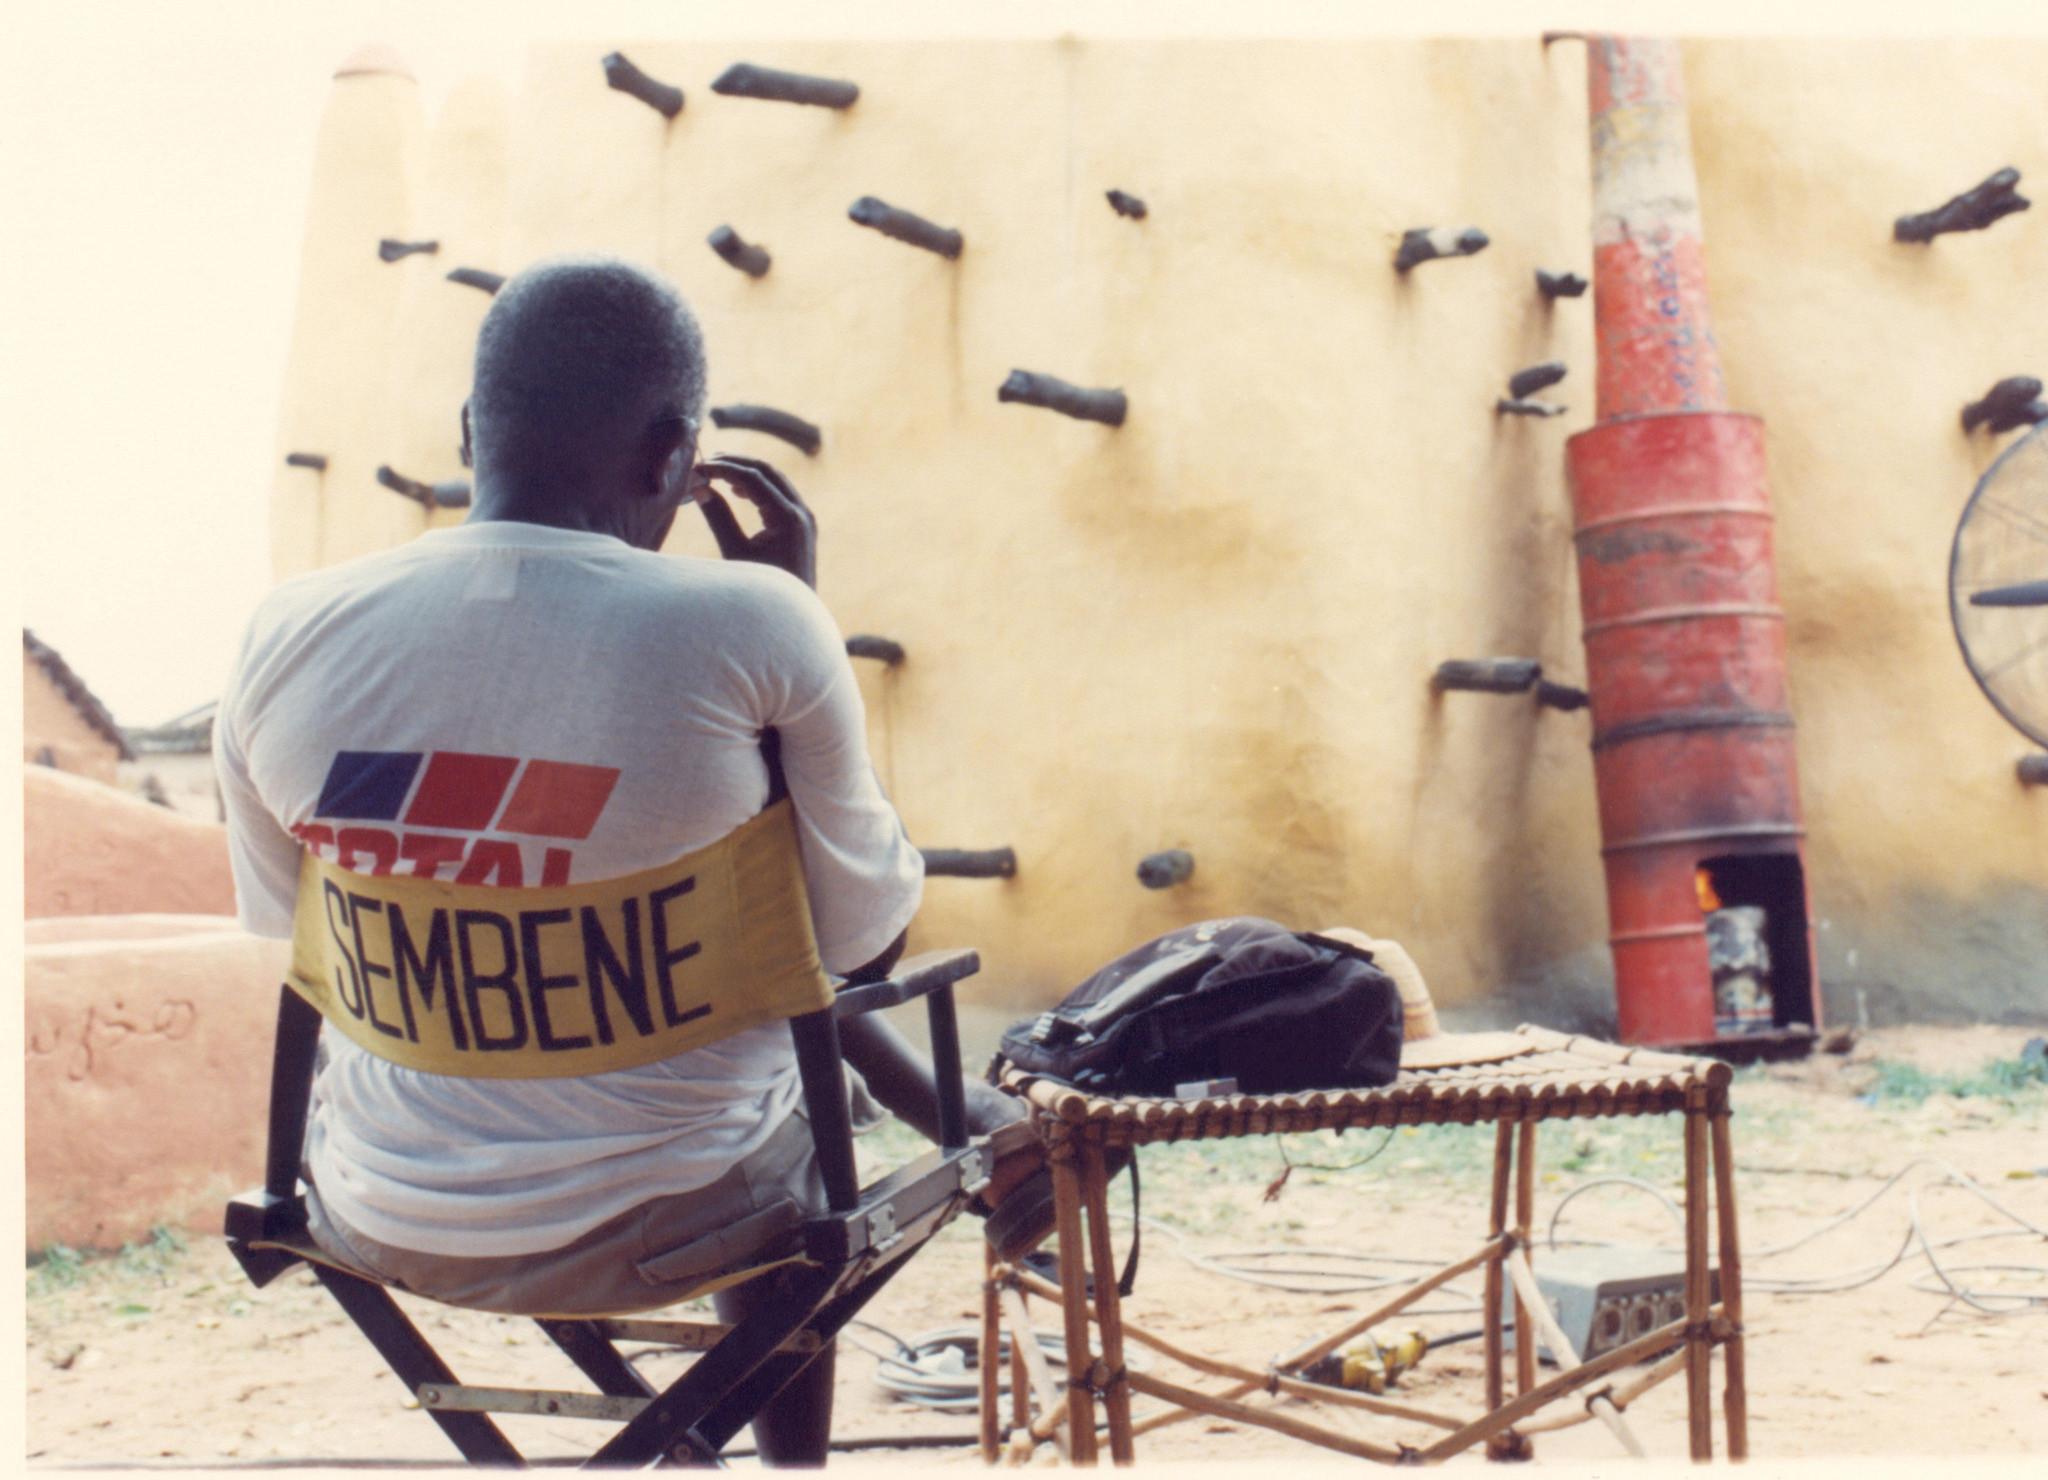 Sembene-TotalTshirt.jpeg